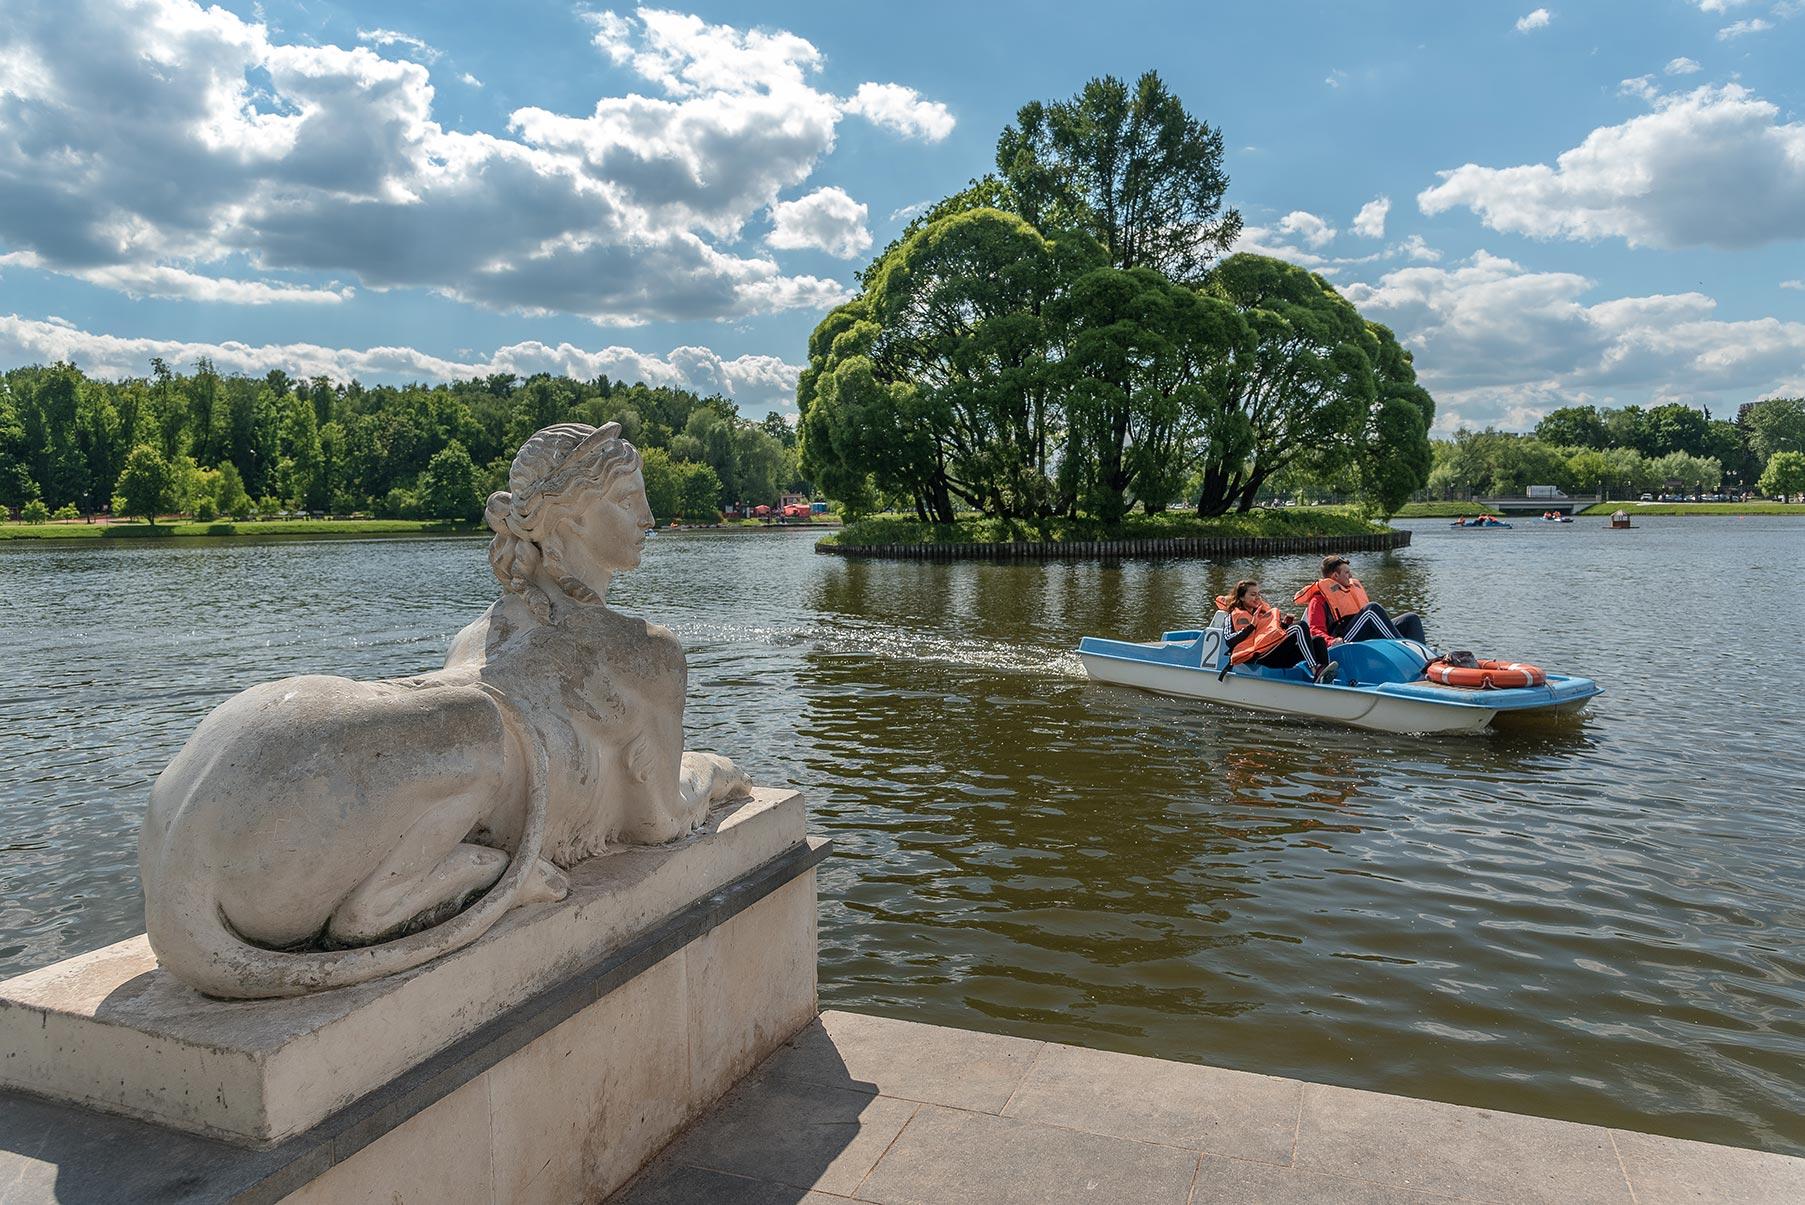 Парк, Царицыно, Москва, пруд, дерево, катамаран, двое, памятник, сфинкс, Борис Недосеков